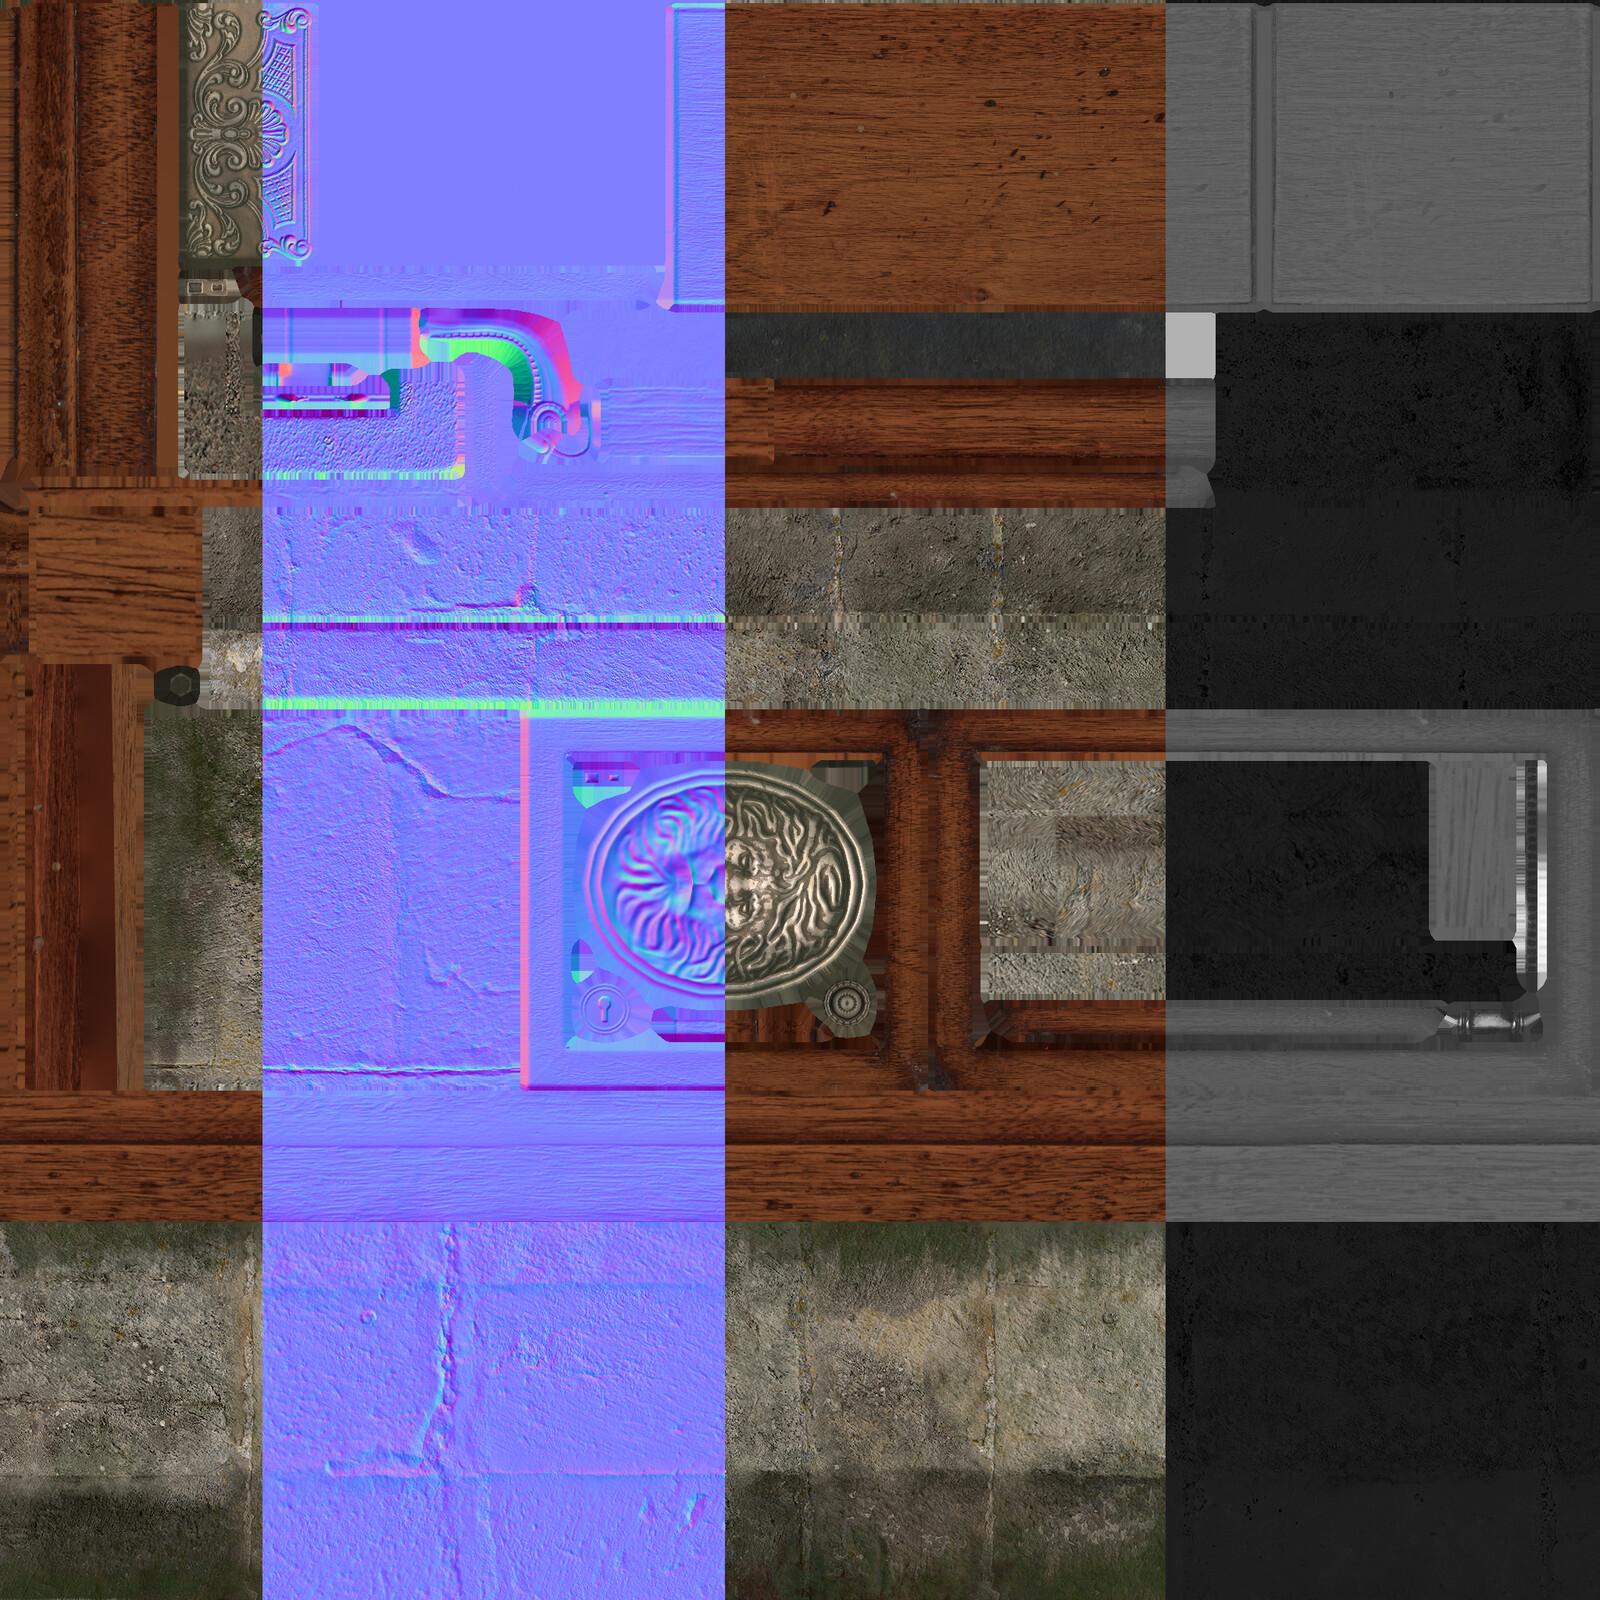 2048x2048 texture, 1024 p/m texeleration, Trim technique